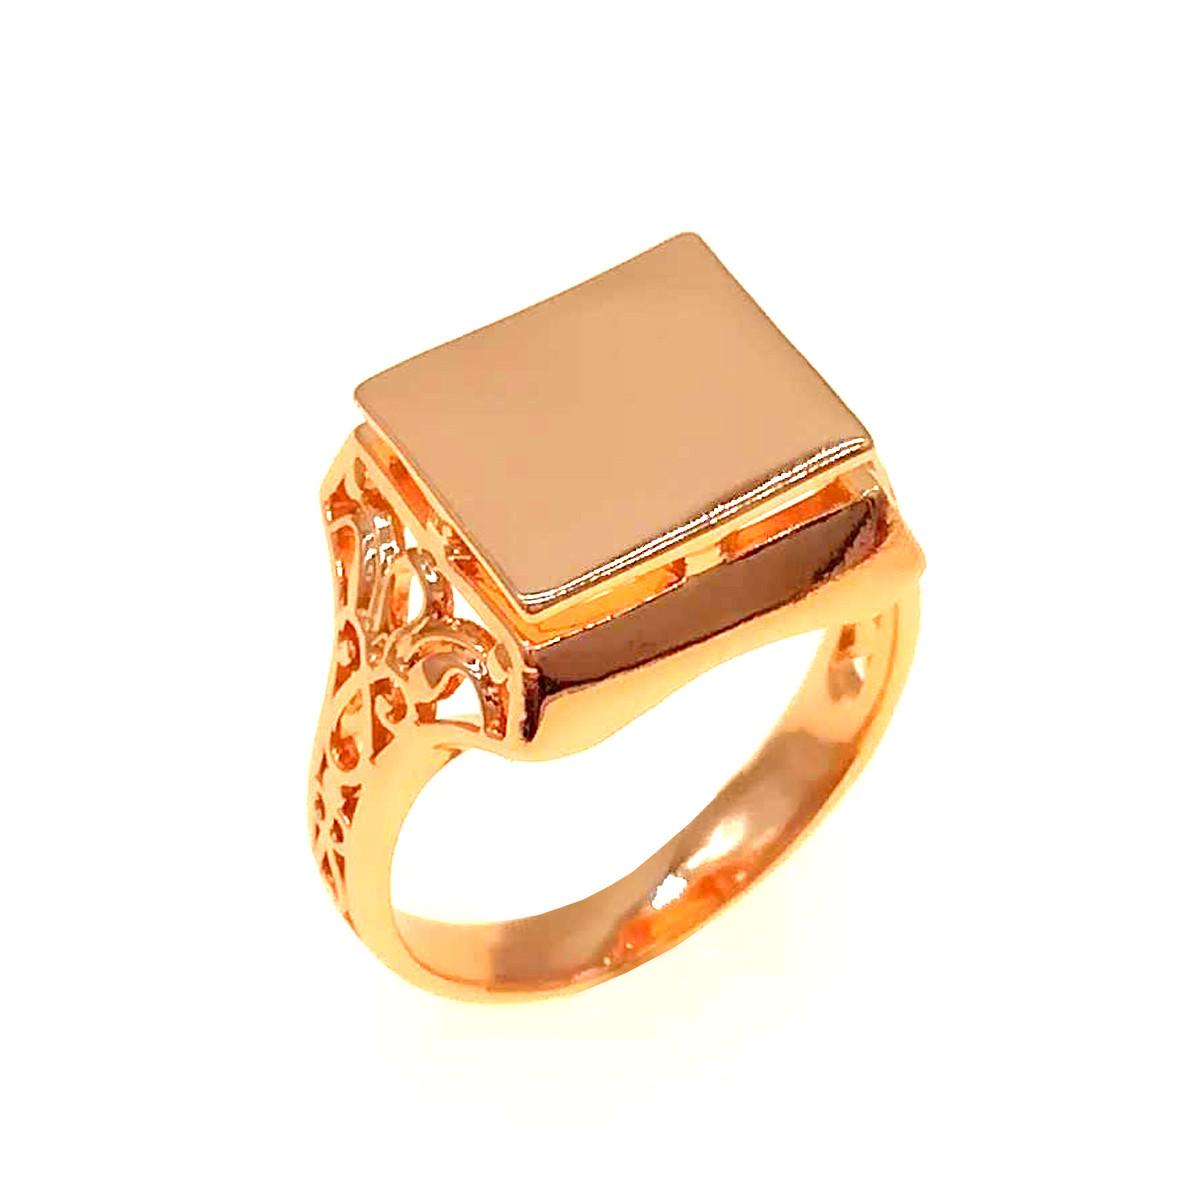 Чоловіче кільце (печатка) Xuping з медичного золота, позолота 18K, 11872 (19)